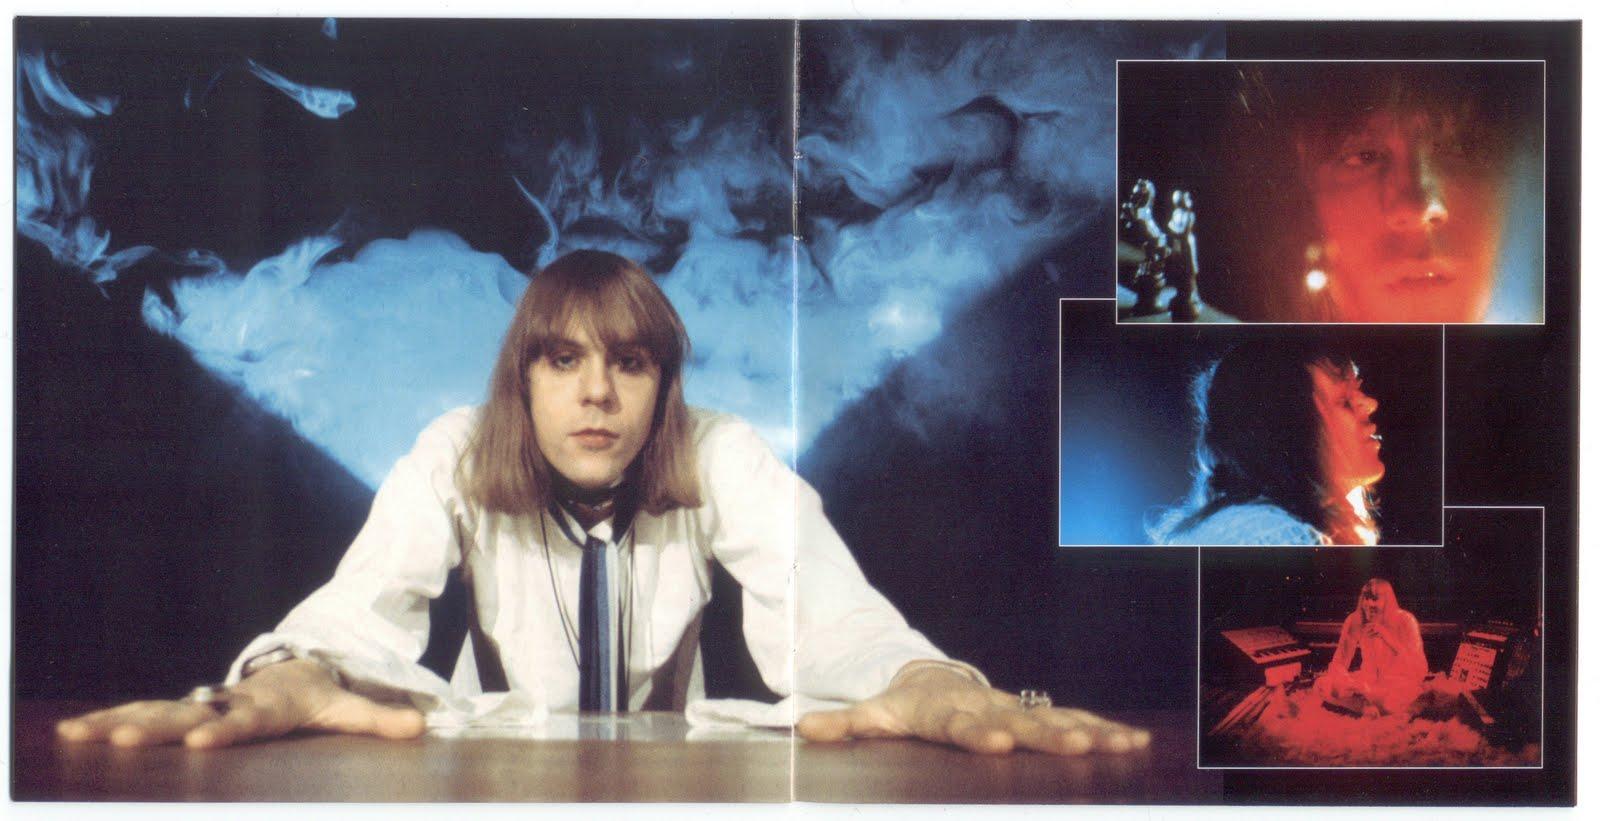 Harald grosskopf synthesist reissue blogspot